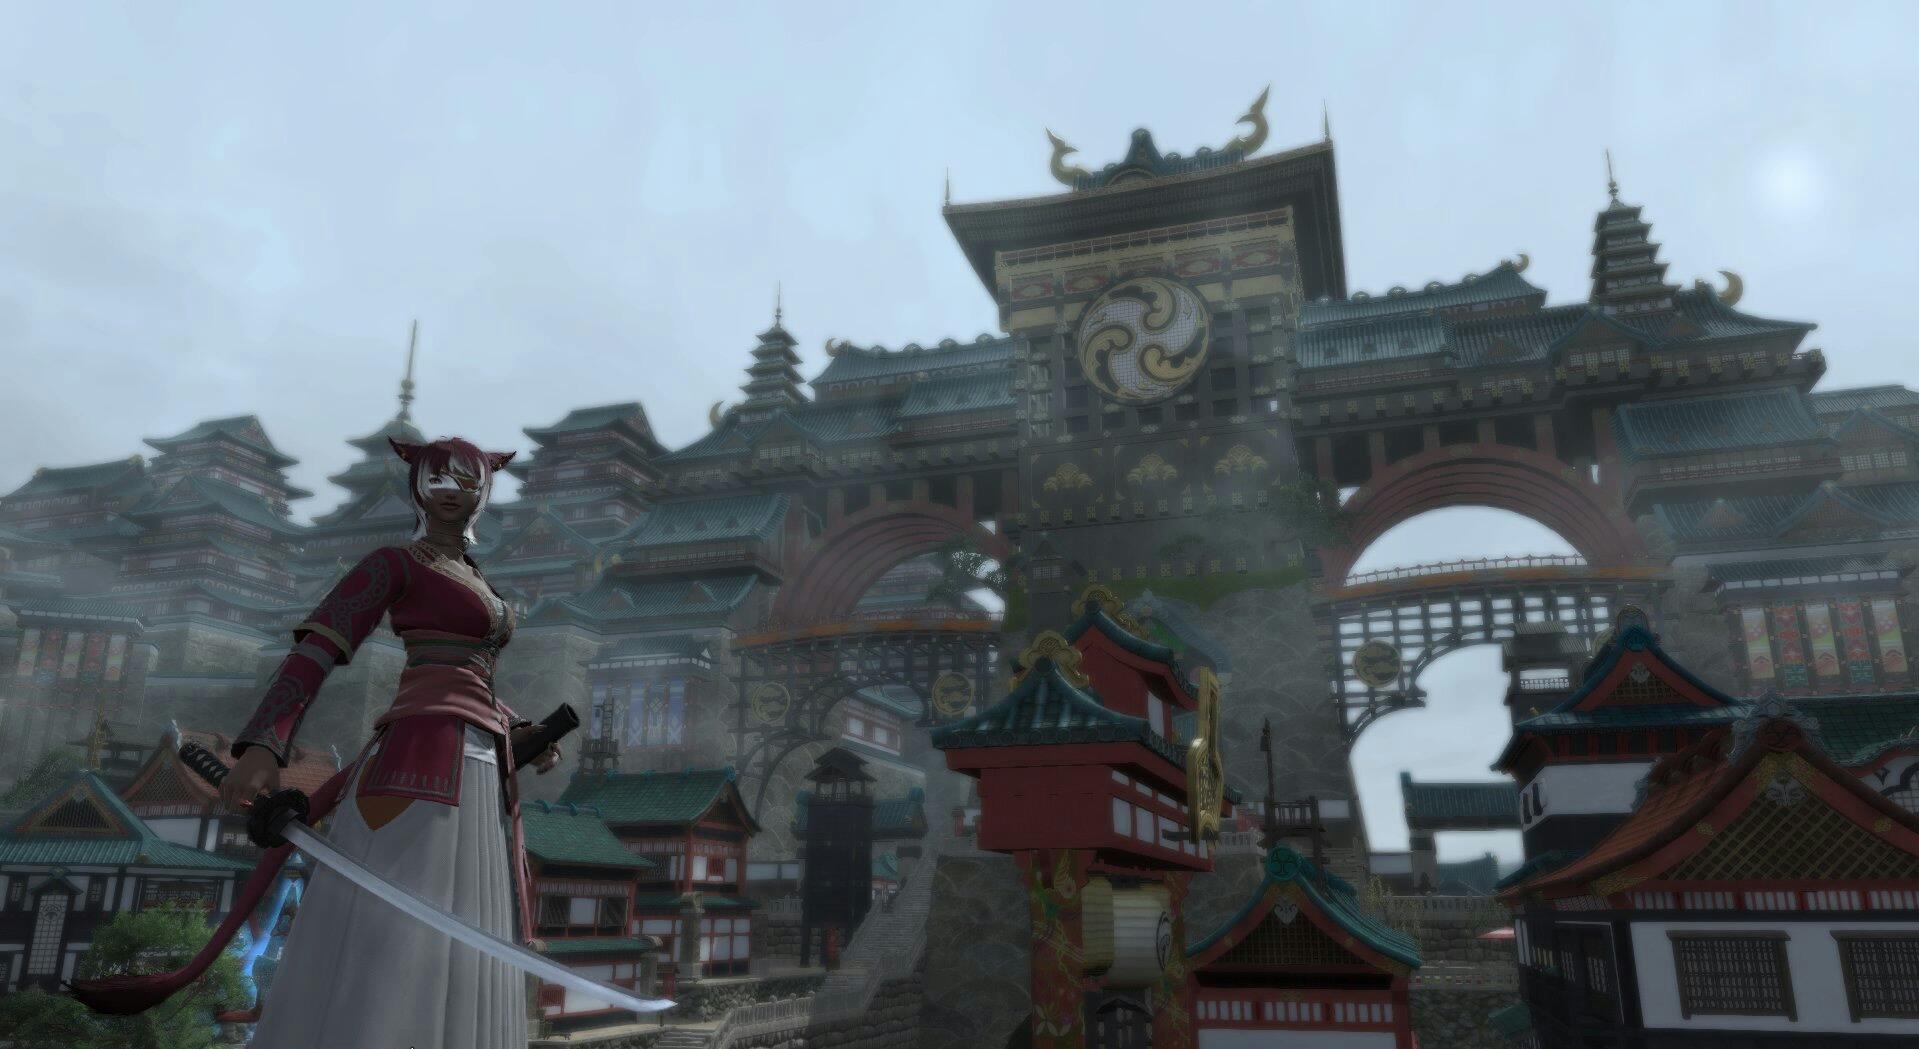 A second opinion on Final Fantasy XIV: Stormblood